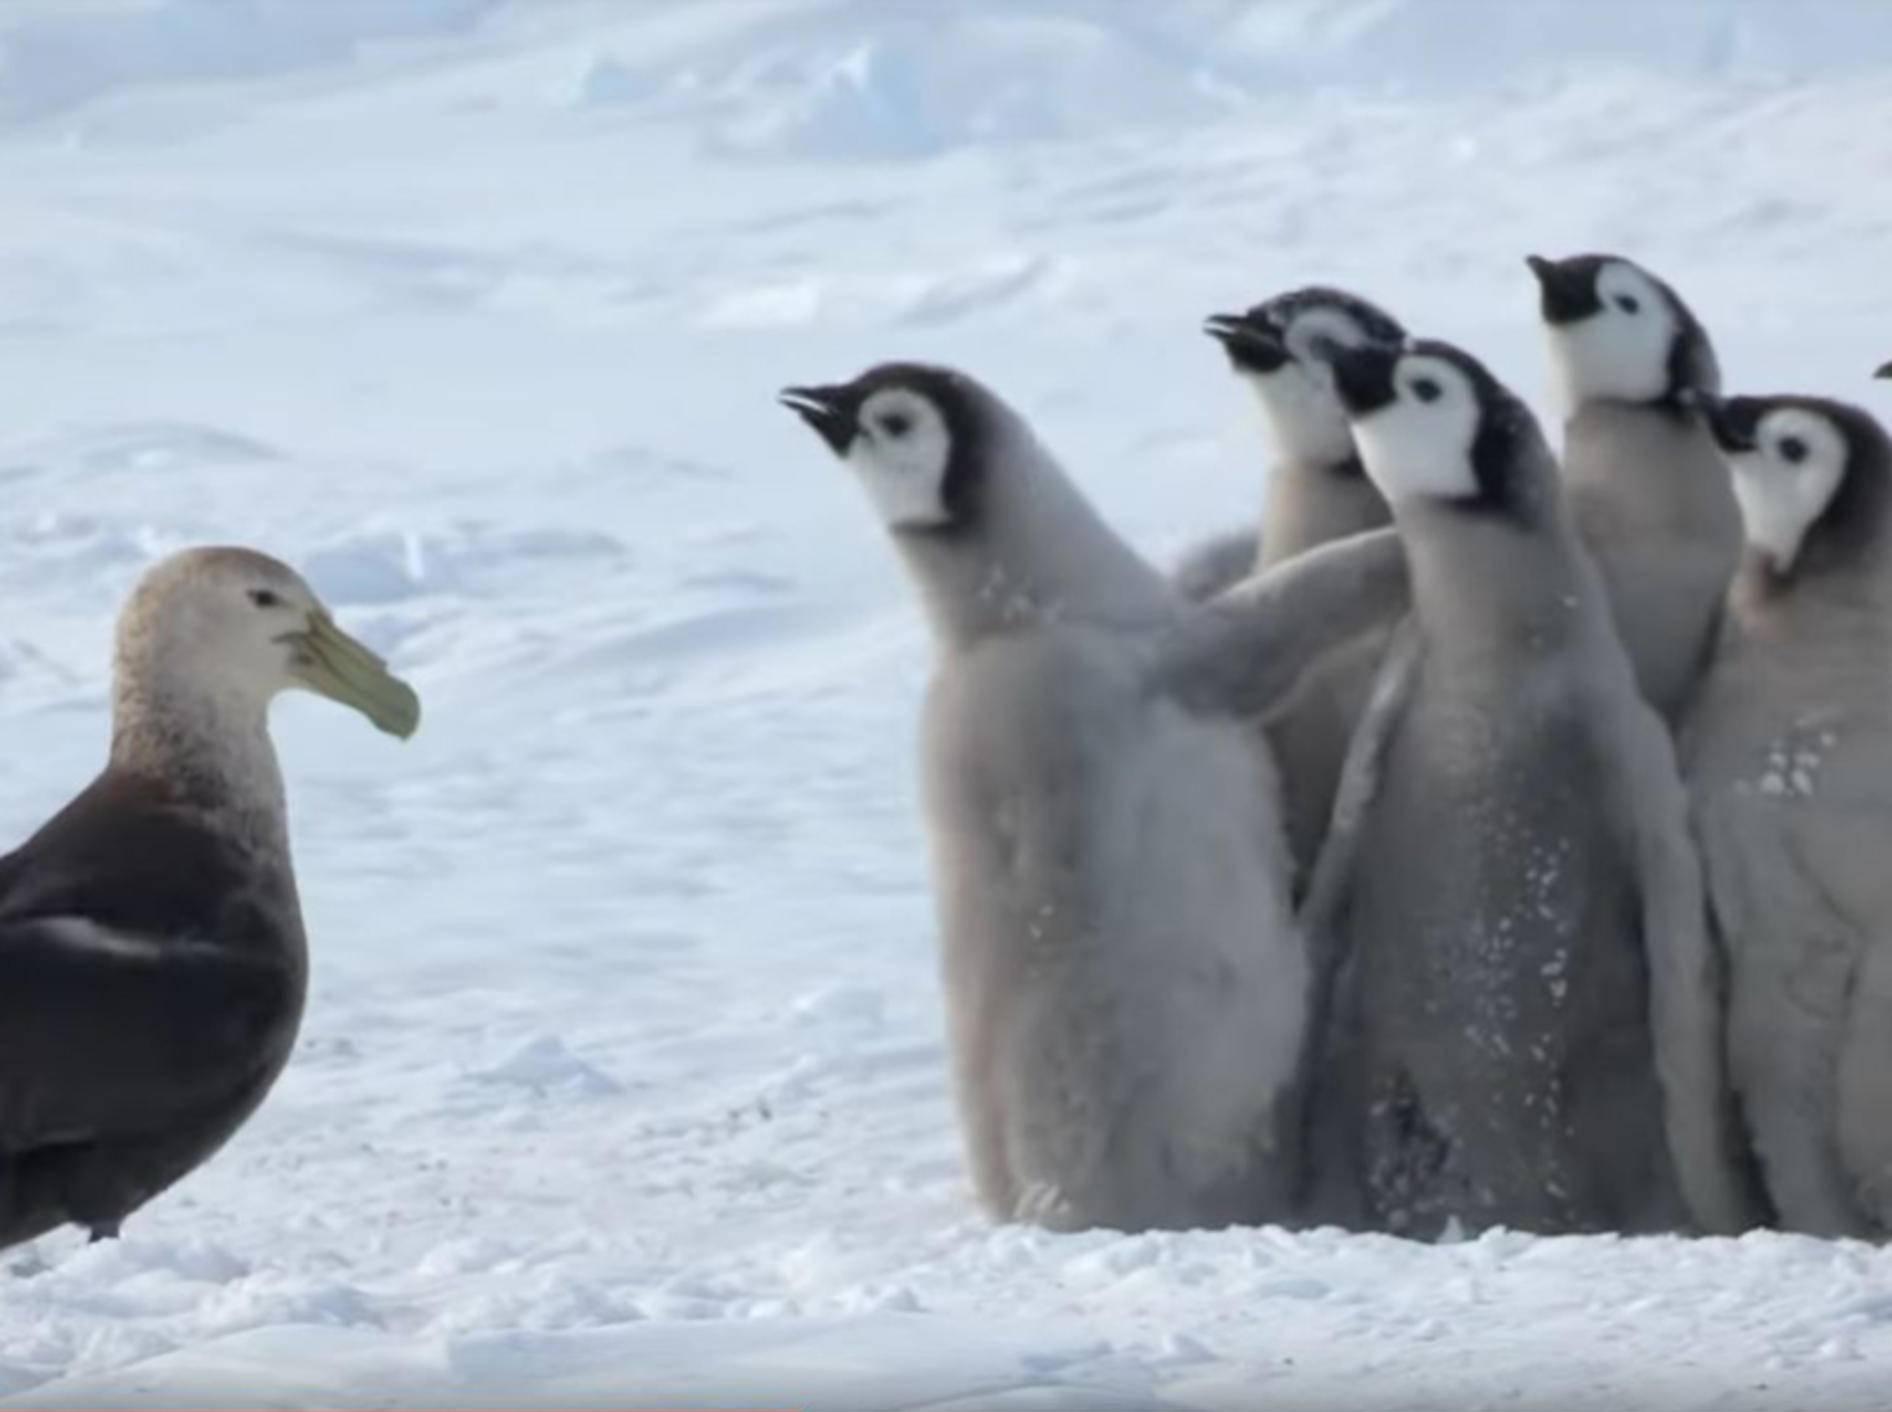 Pinguinküken in letzter Sekunde vor Riesensturmvogel gerettet! – YouTube / BBC